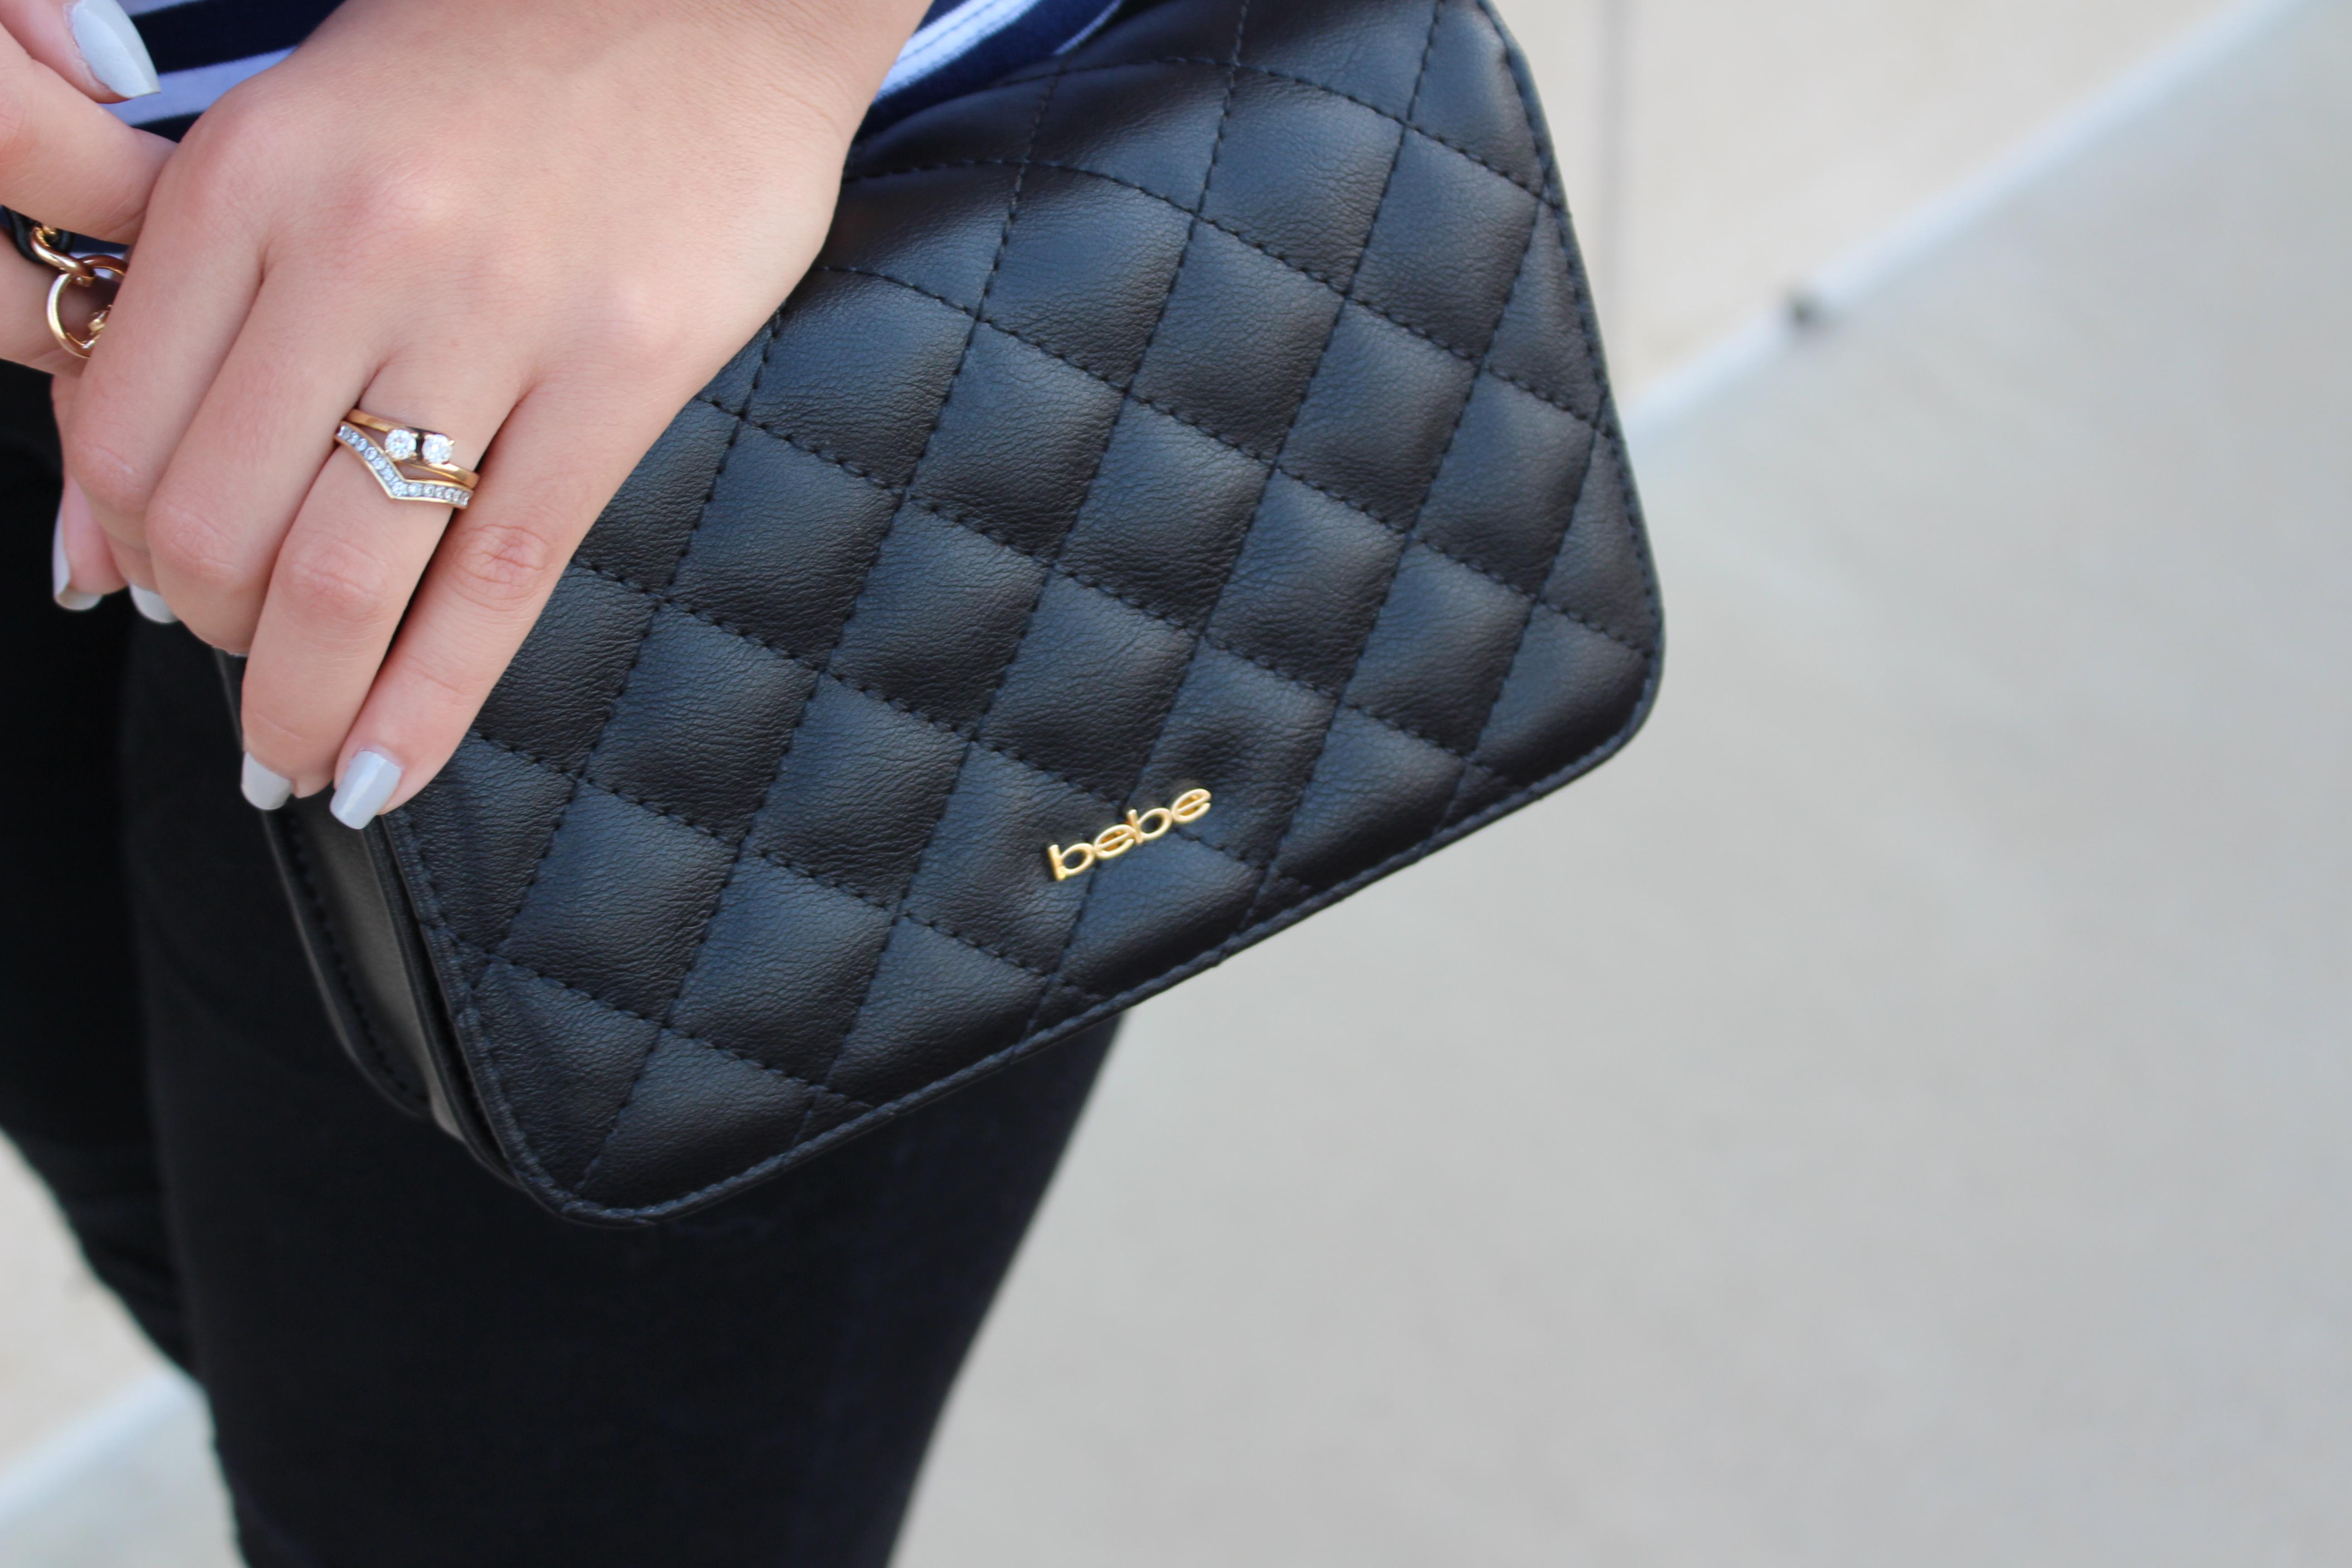 jeans negros black jeans old navy stripe shirt bebe bag charlotte russe choker outfit ripped jeans details steve madden sandals OOTD by alejandra avila tu fashionpetite